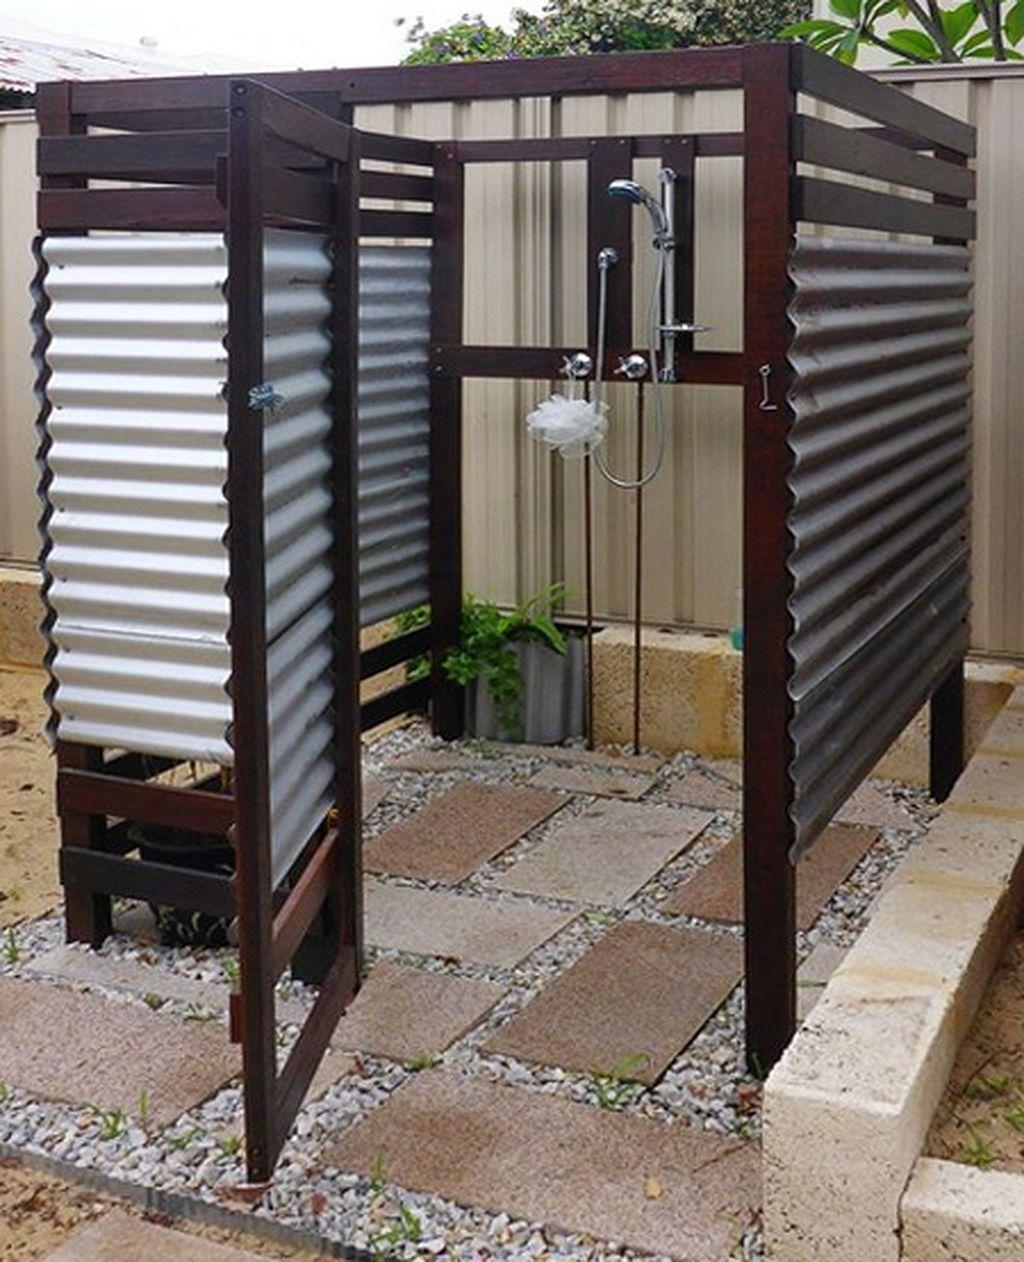 70 Outdoor Shower Ideas